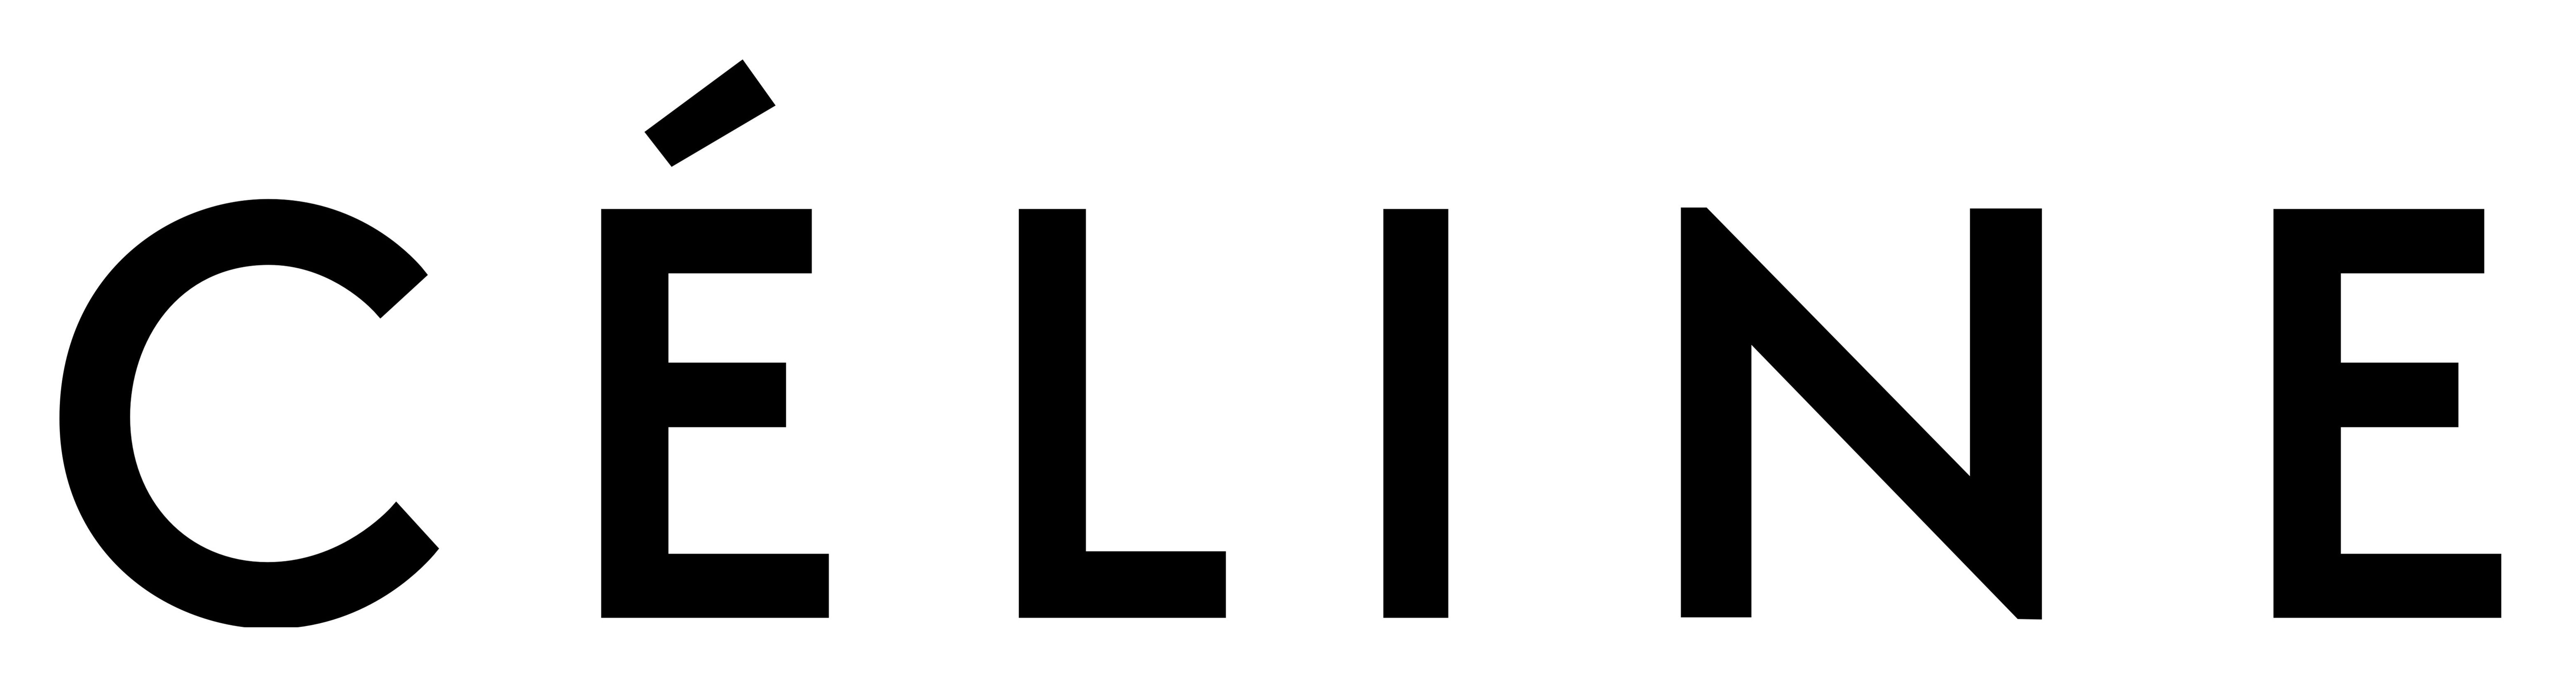 celinelogowallpaper21.jpg (6250×1675) Celine, Logos